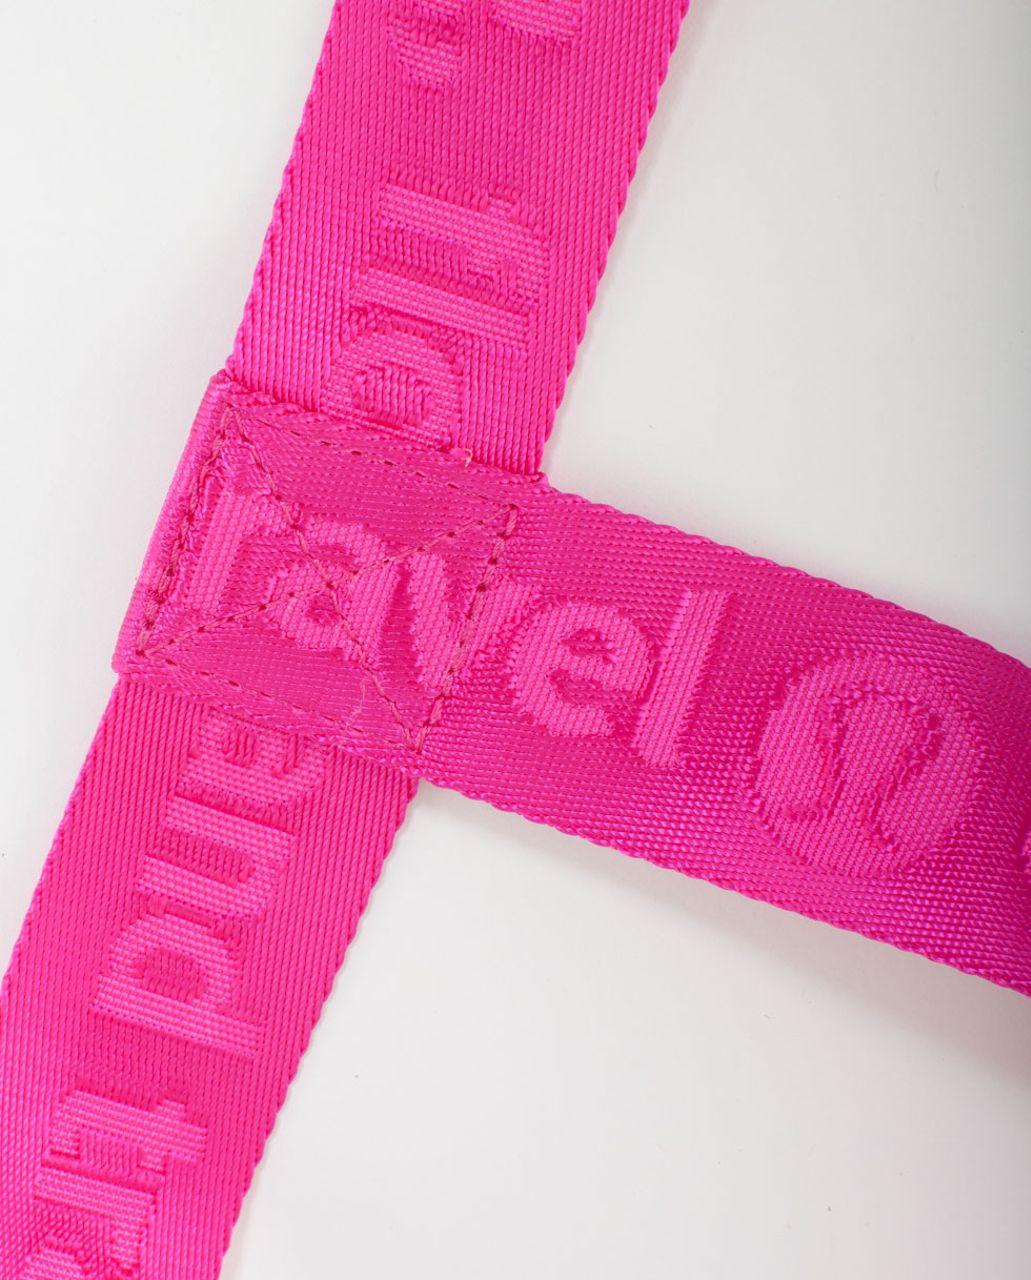 Lululemon No-Brainer Mat Strap - Paris Pink